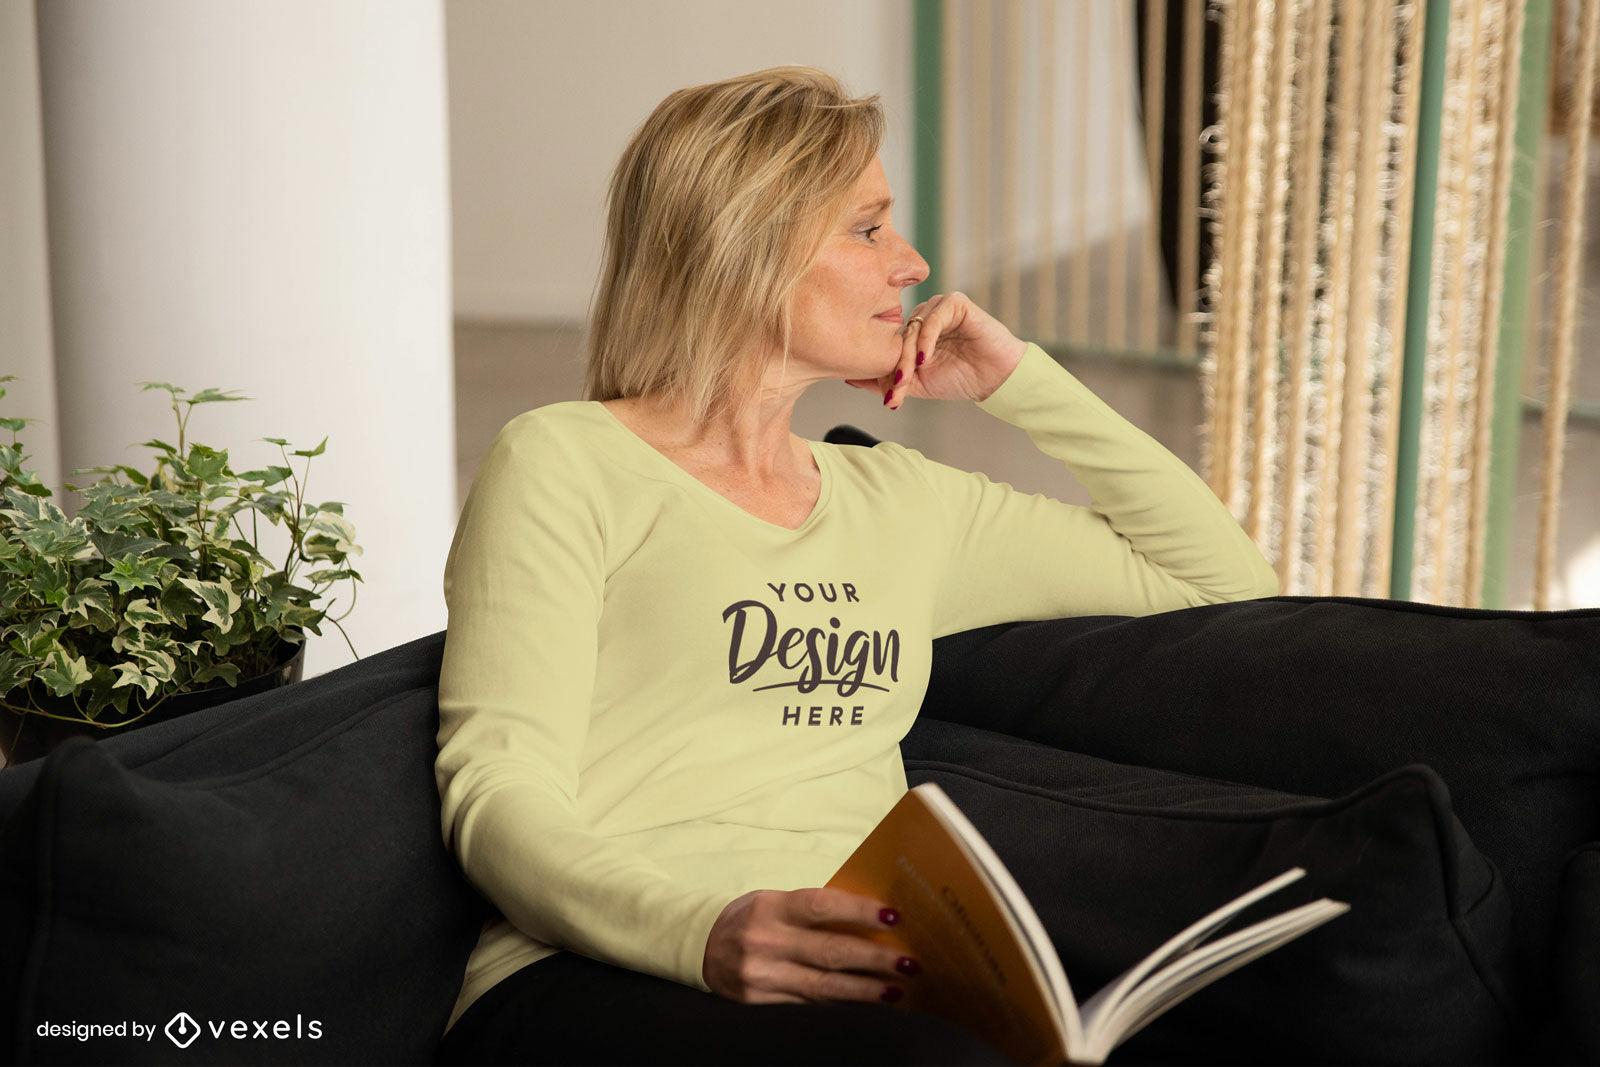 Mujer en camiseta amarilla de manga larga sentada maqueta